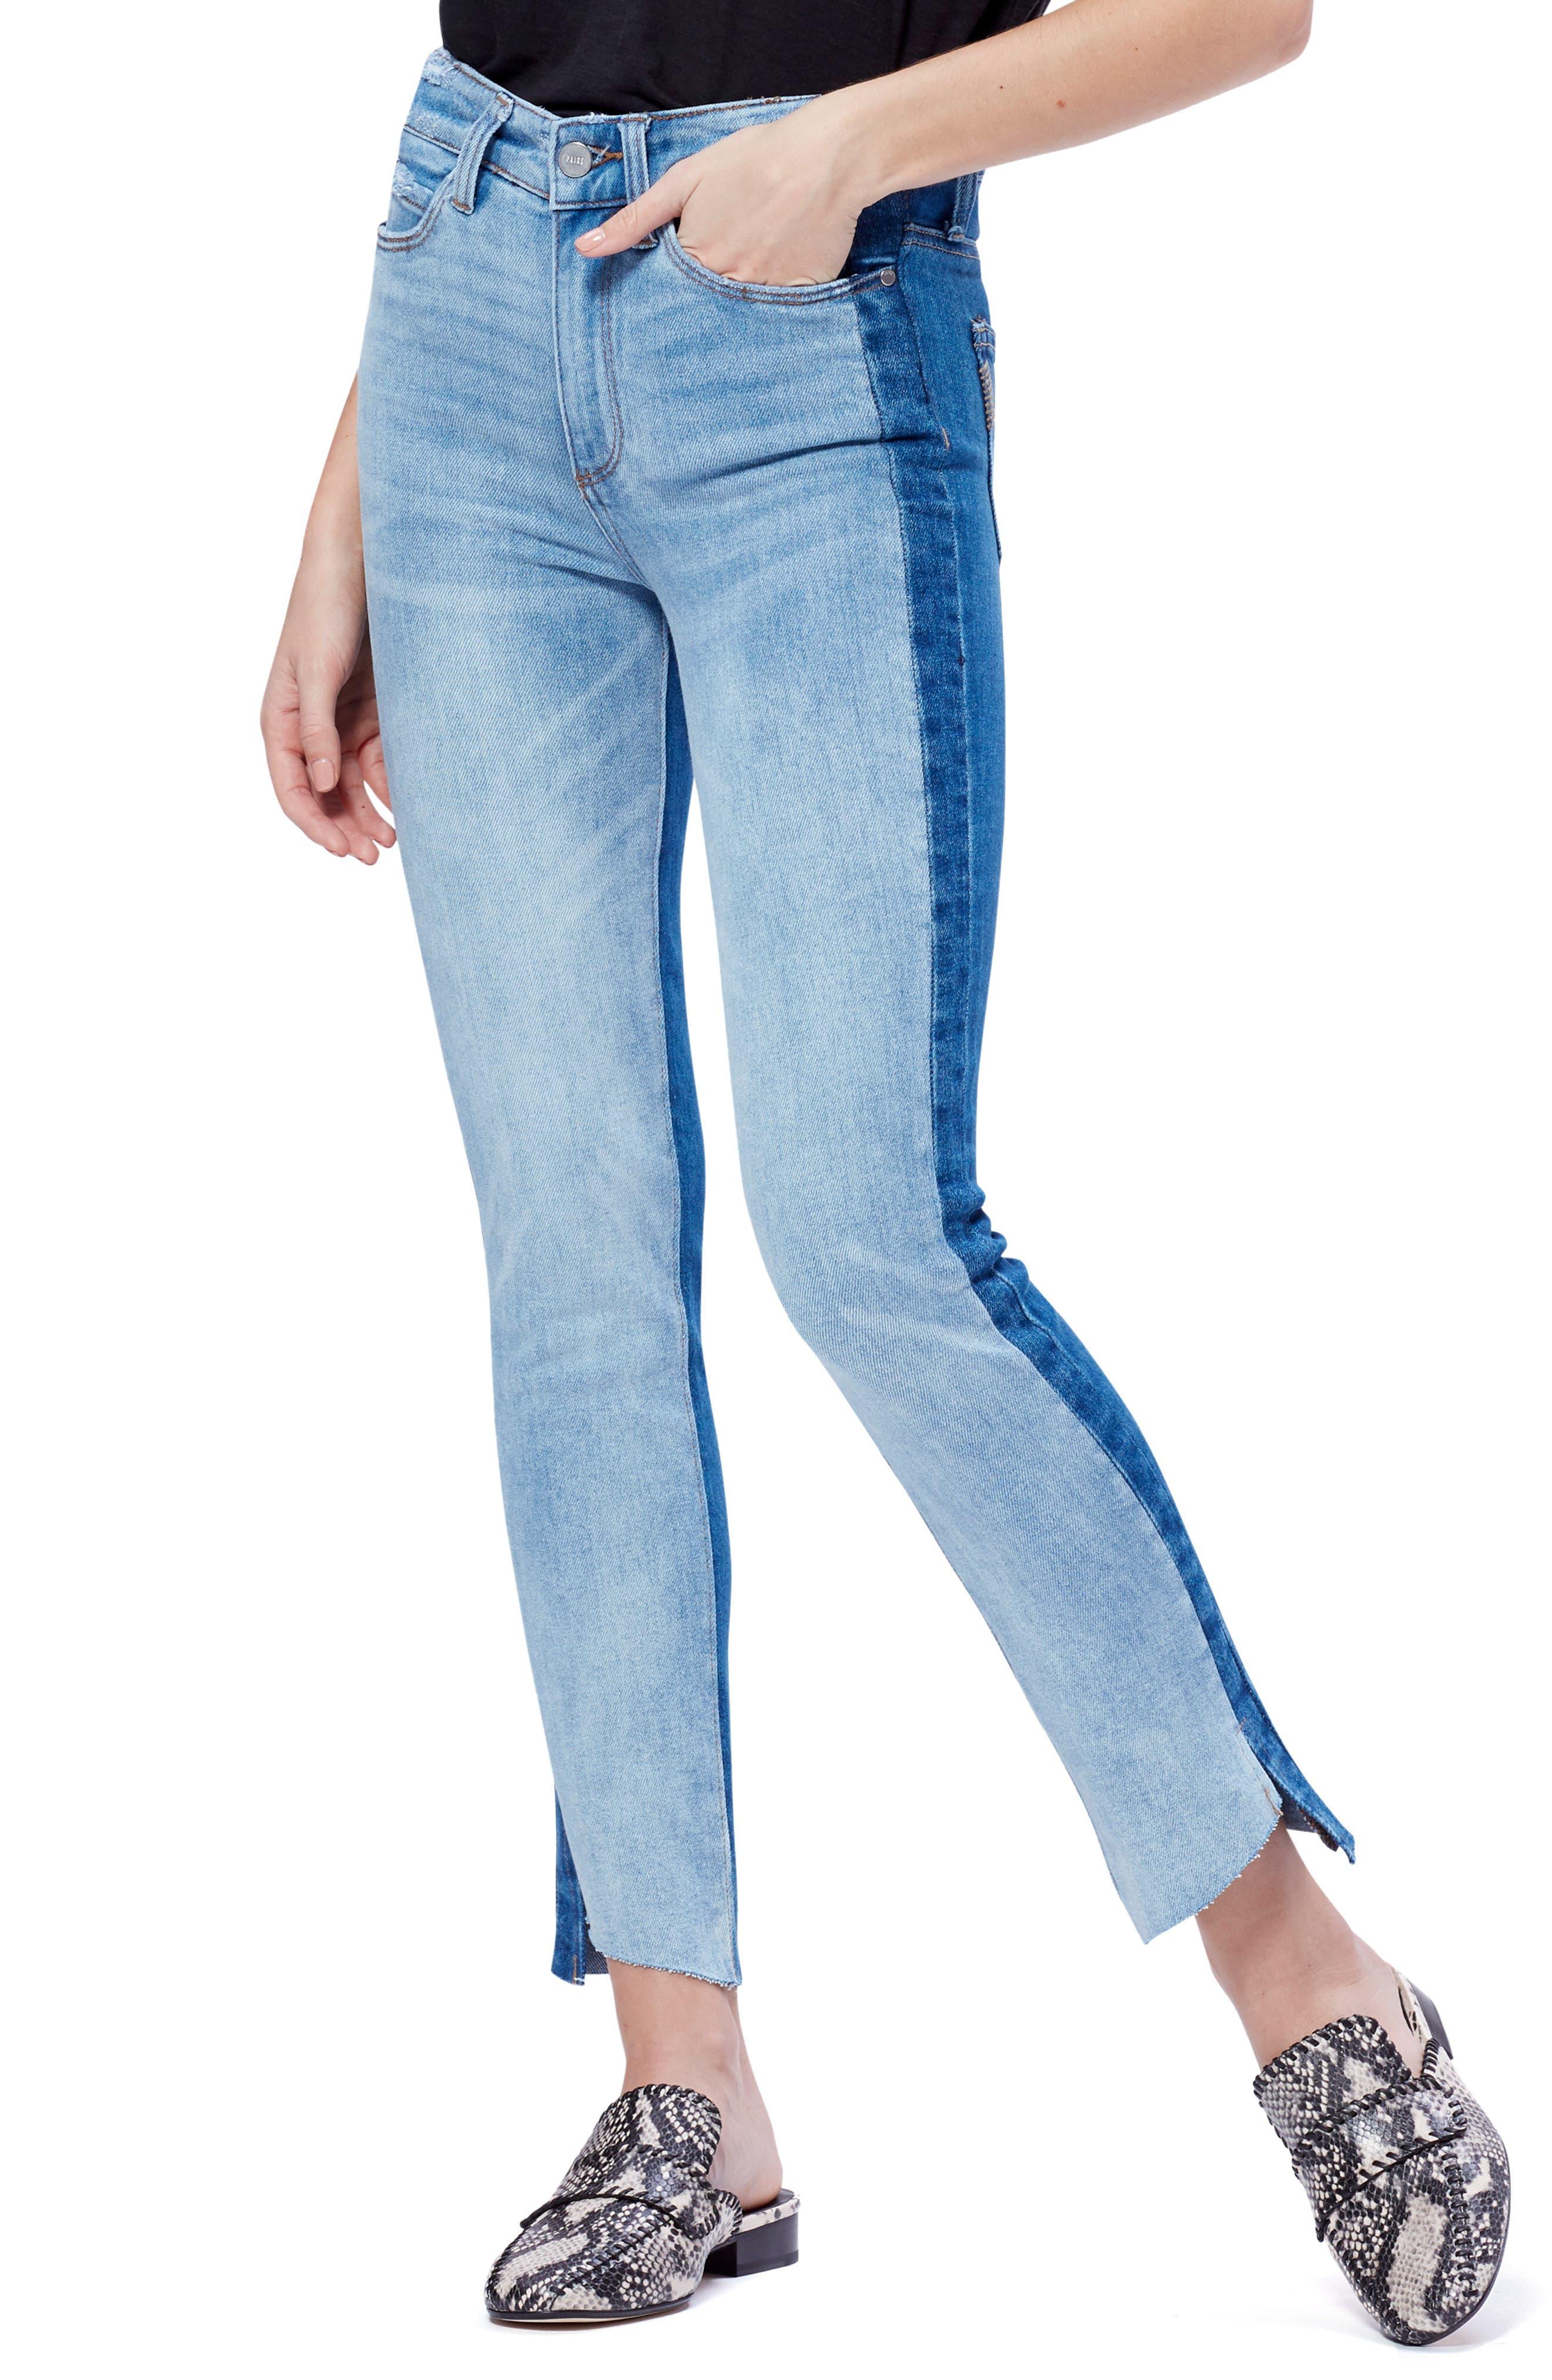 Paige Jeans HOXTON TWO-TONE HIGH WAIST SLIM JEANS